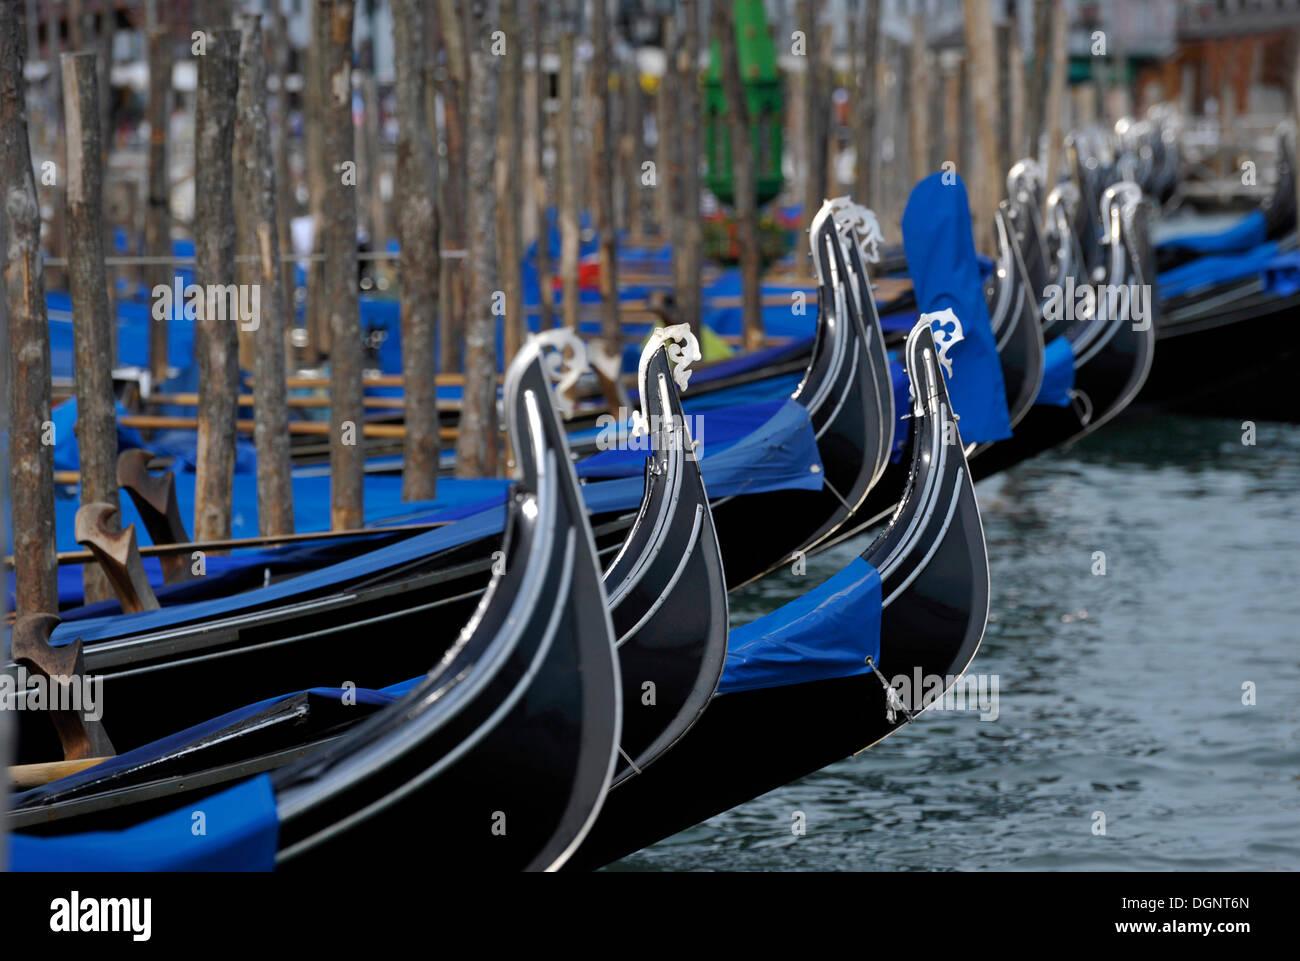 Gondolas on a pier, Bacino di San Marco, Venezia, Venice, Italy, Europe - Stock Image